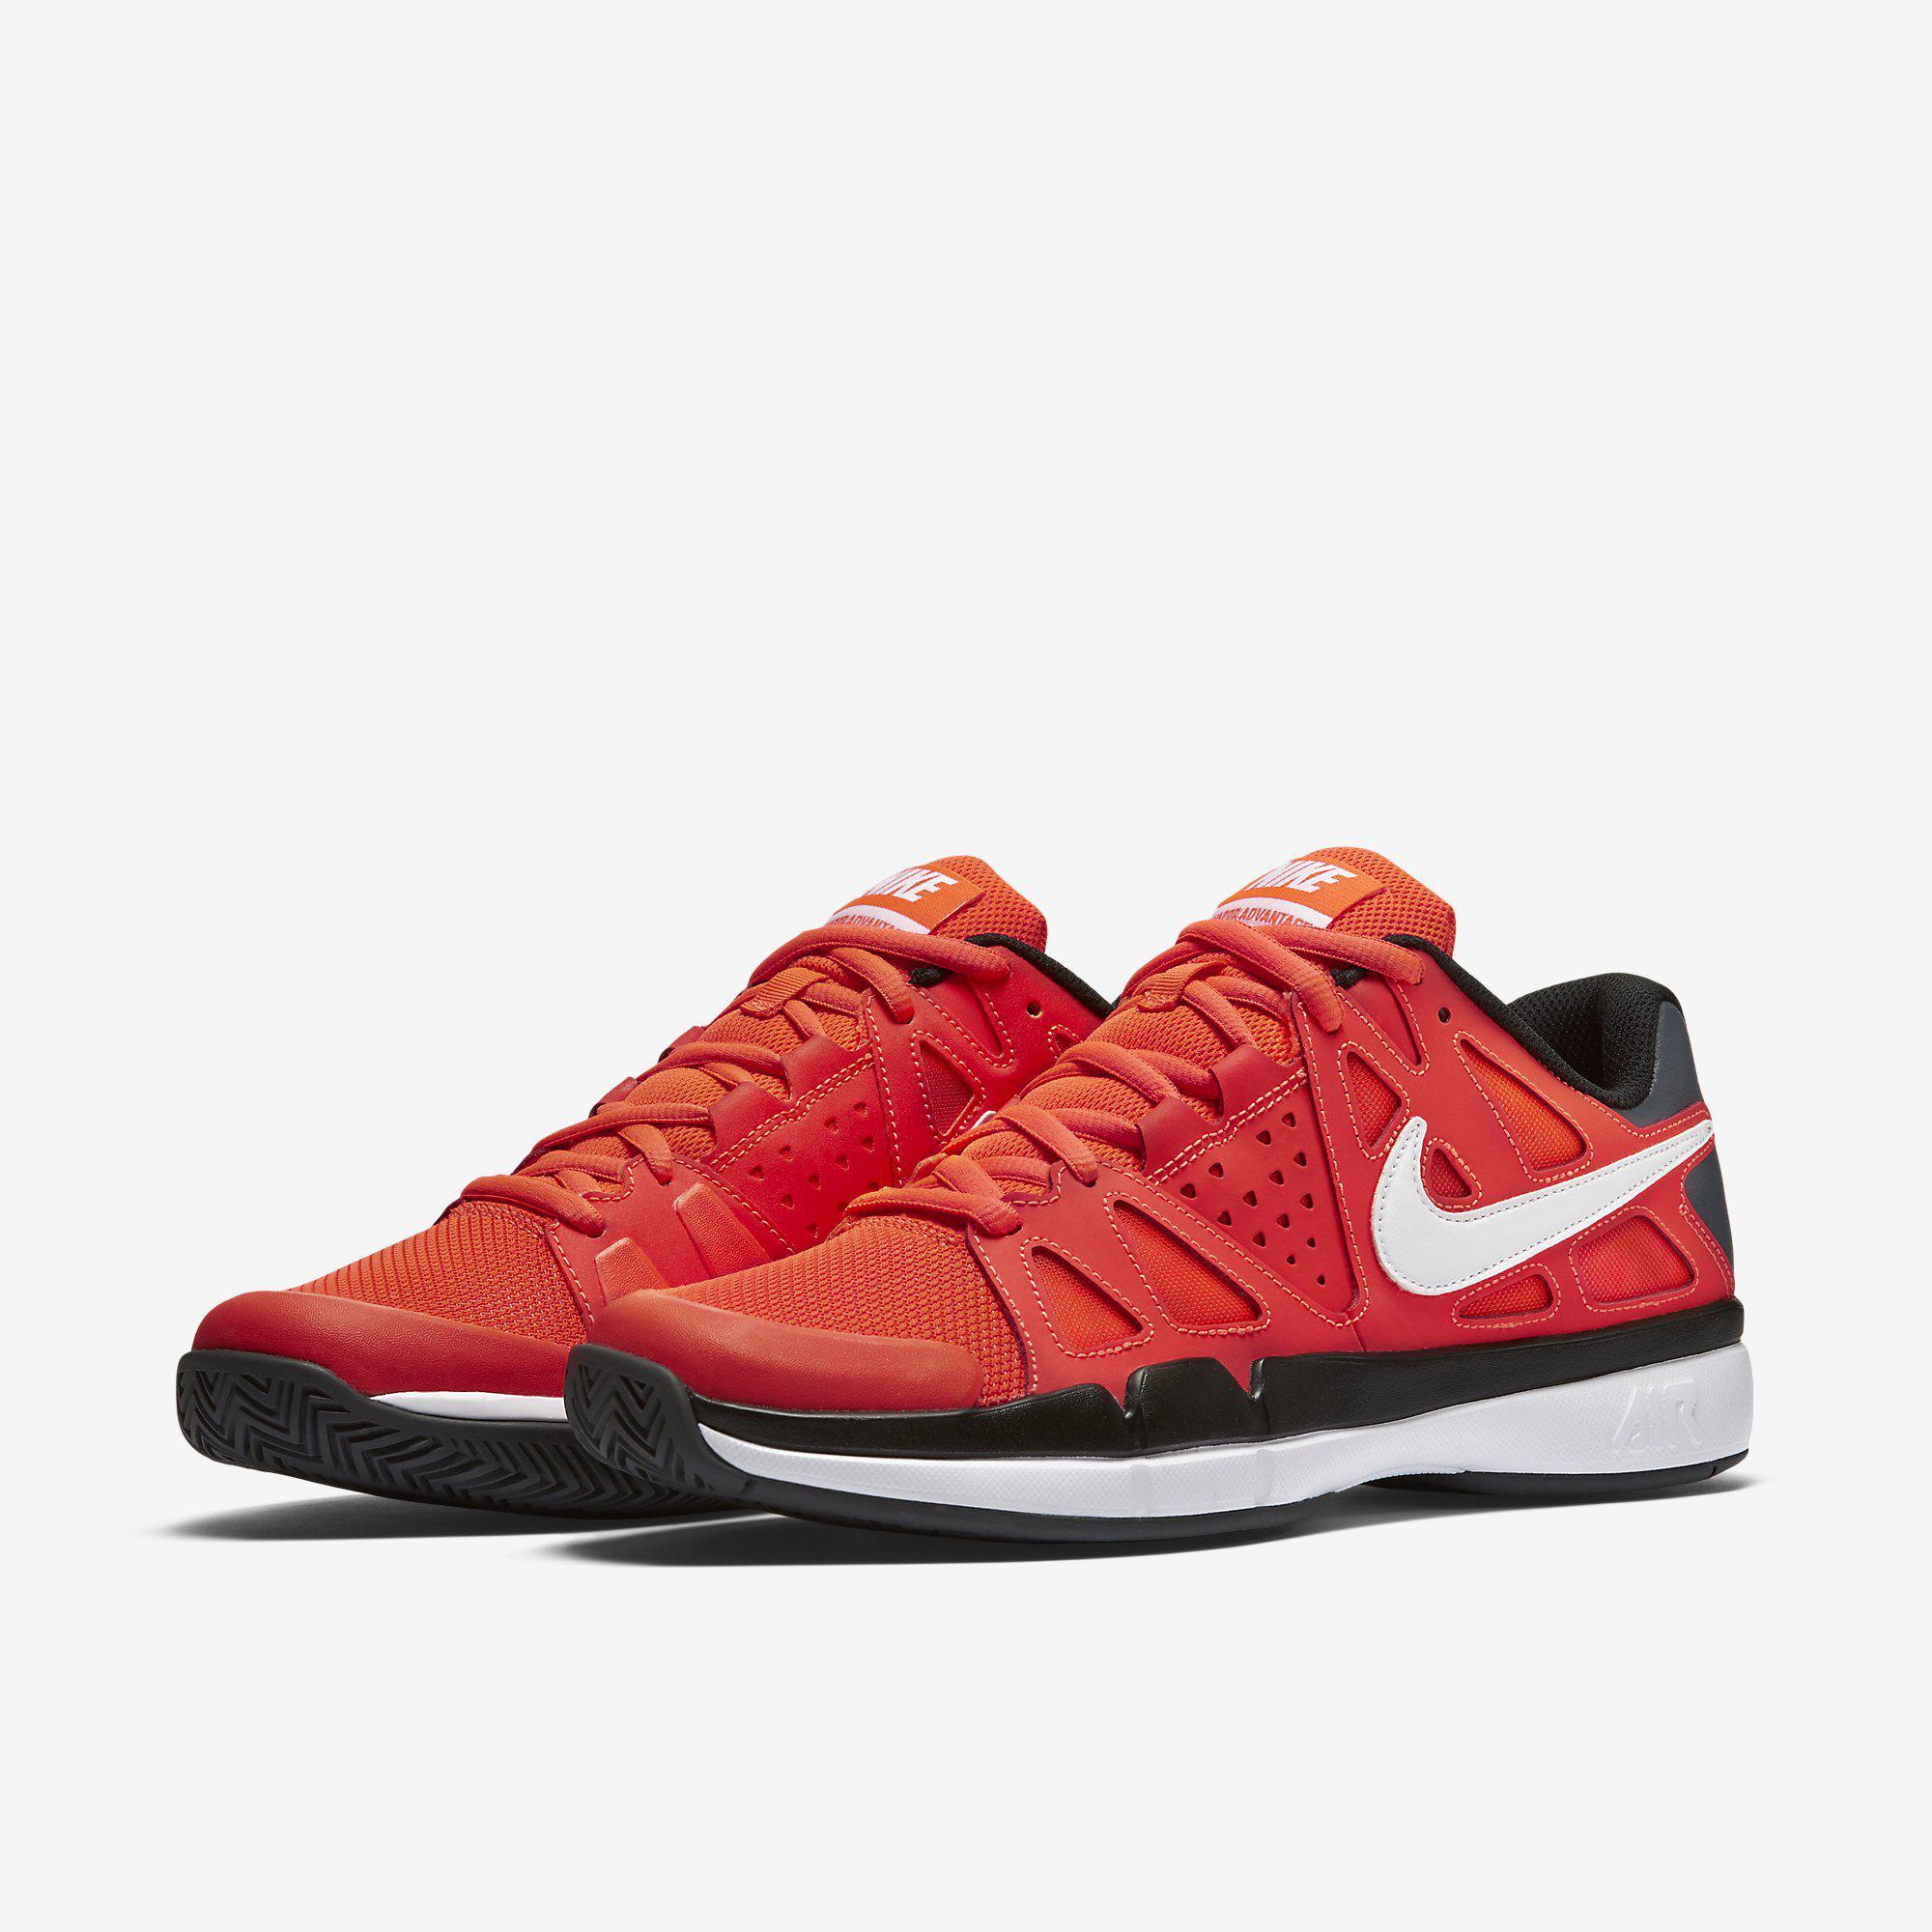 Nike Mens Air Vapor Advantage Tennis Shoes - Orange Black ... 23ad47f72